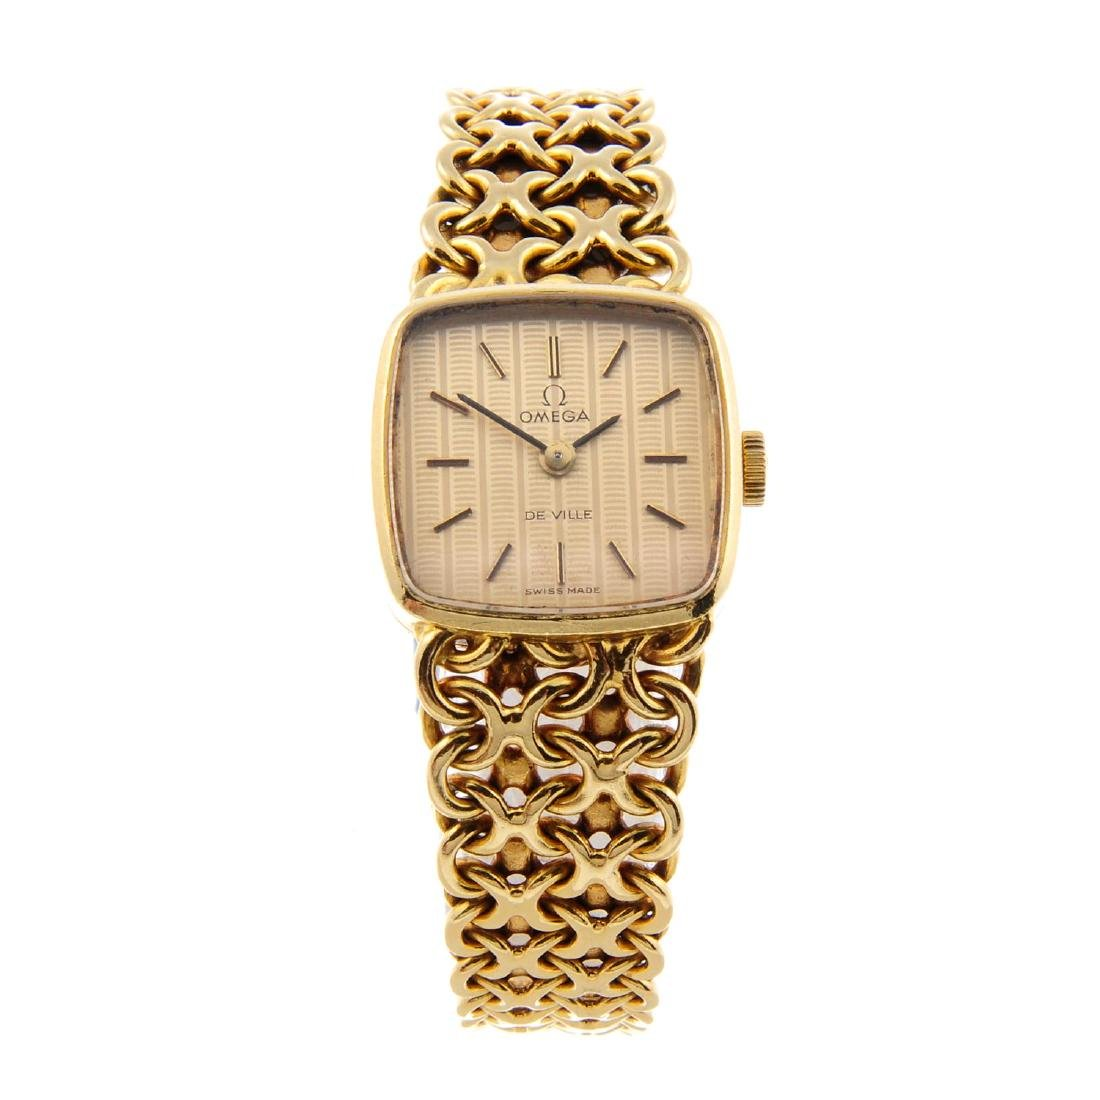 OMEGA - a lady's De Ville bracelet watch. 18ct yellow